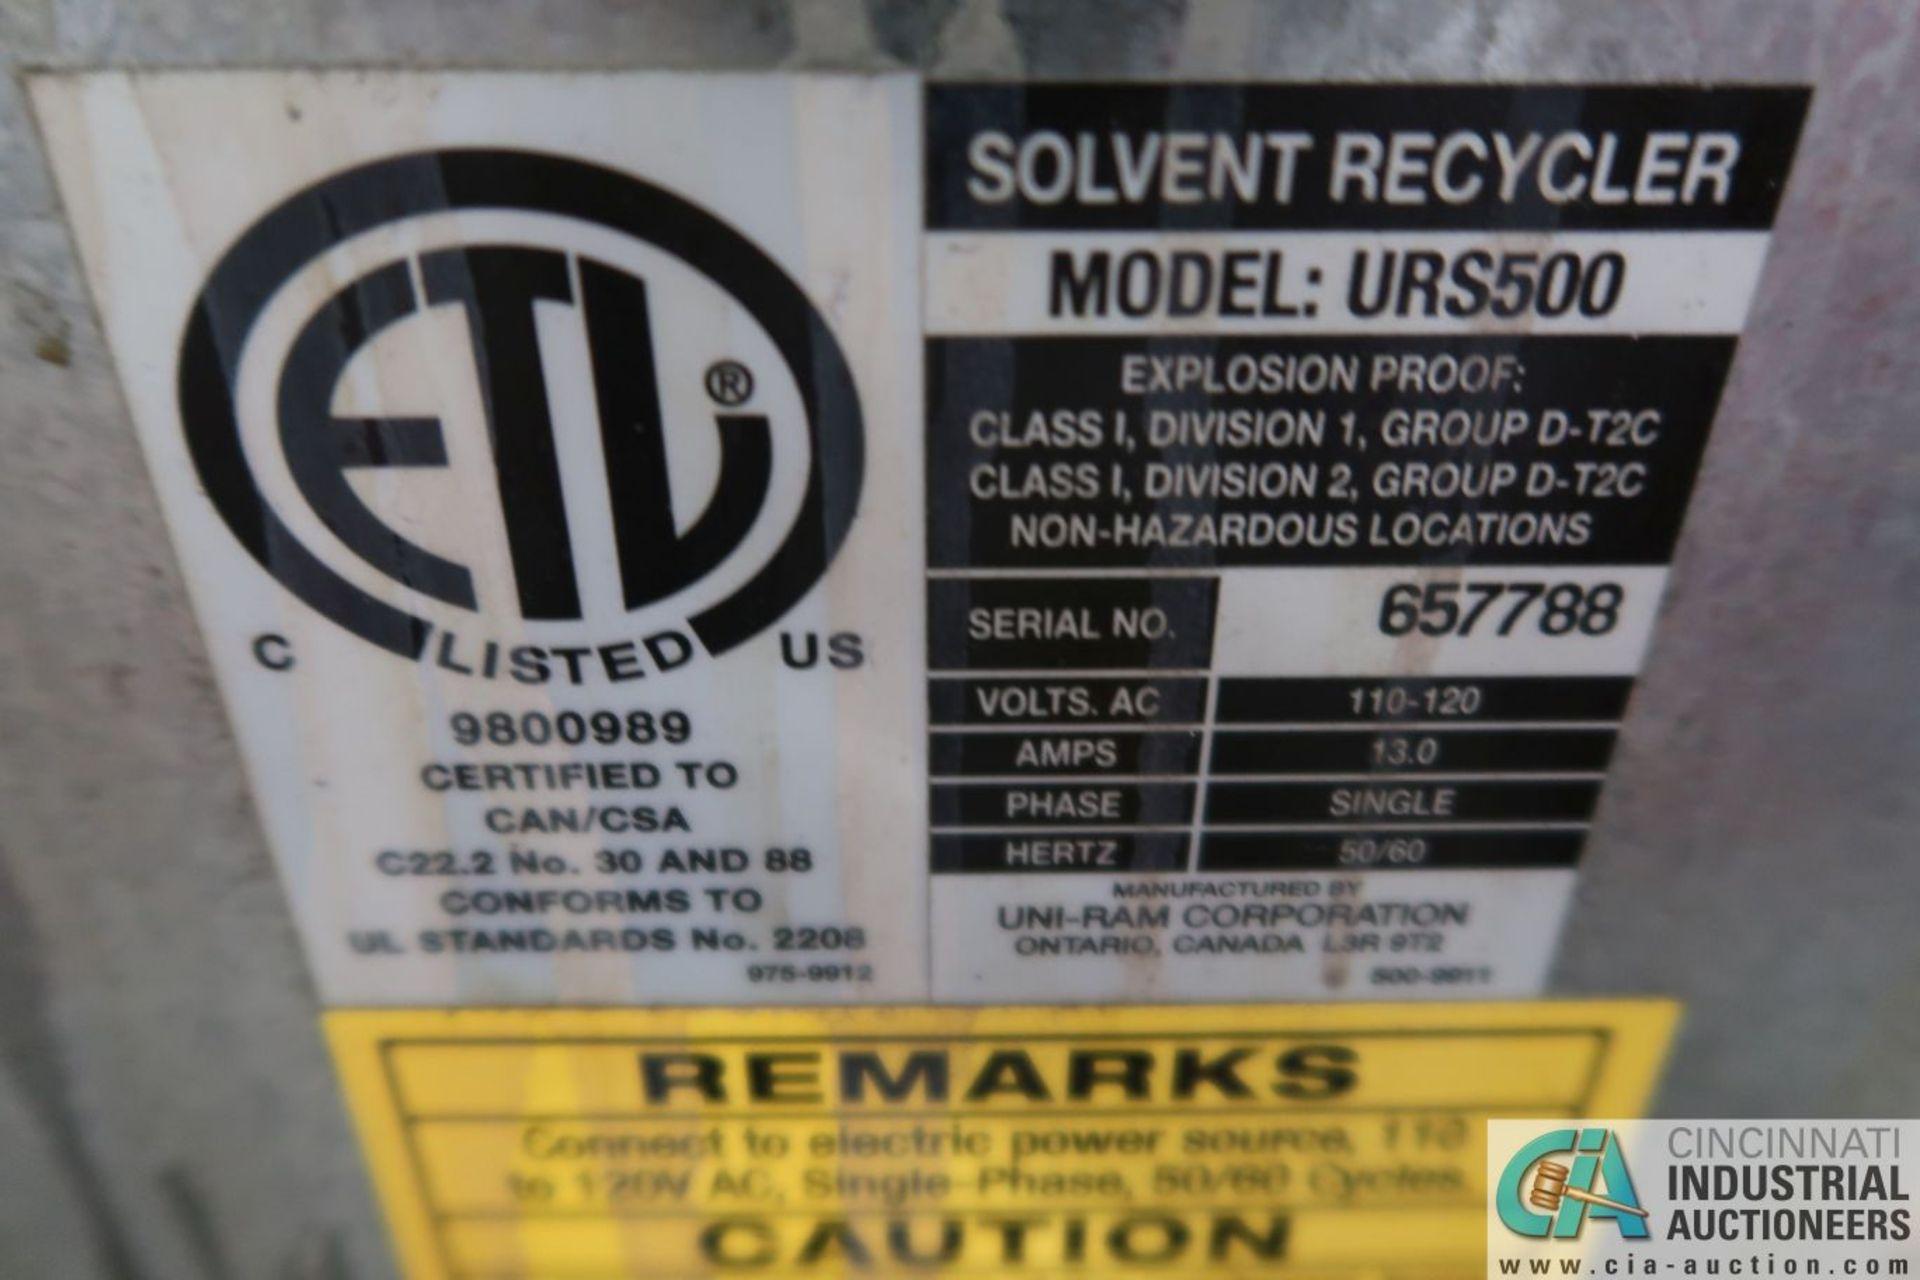 UNI-RAM MODEL URS500 SOLVENT RECYCLER; S/N 657788 - Image 4 of 4